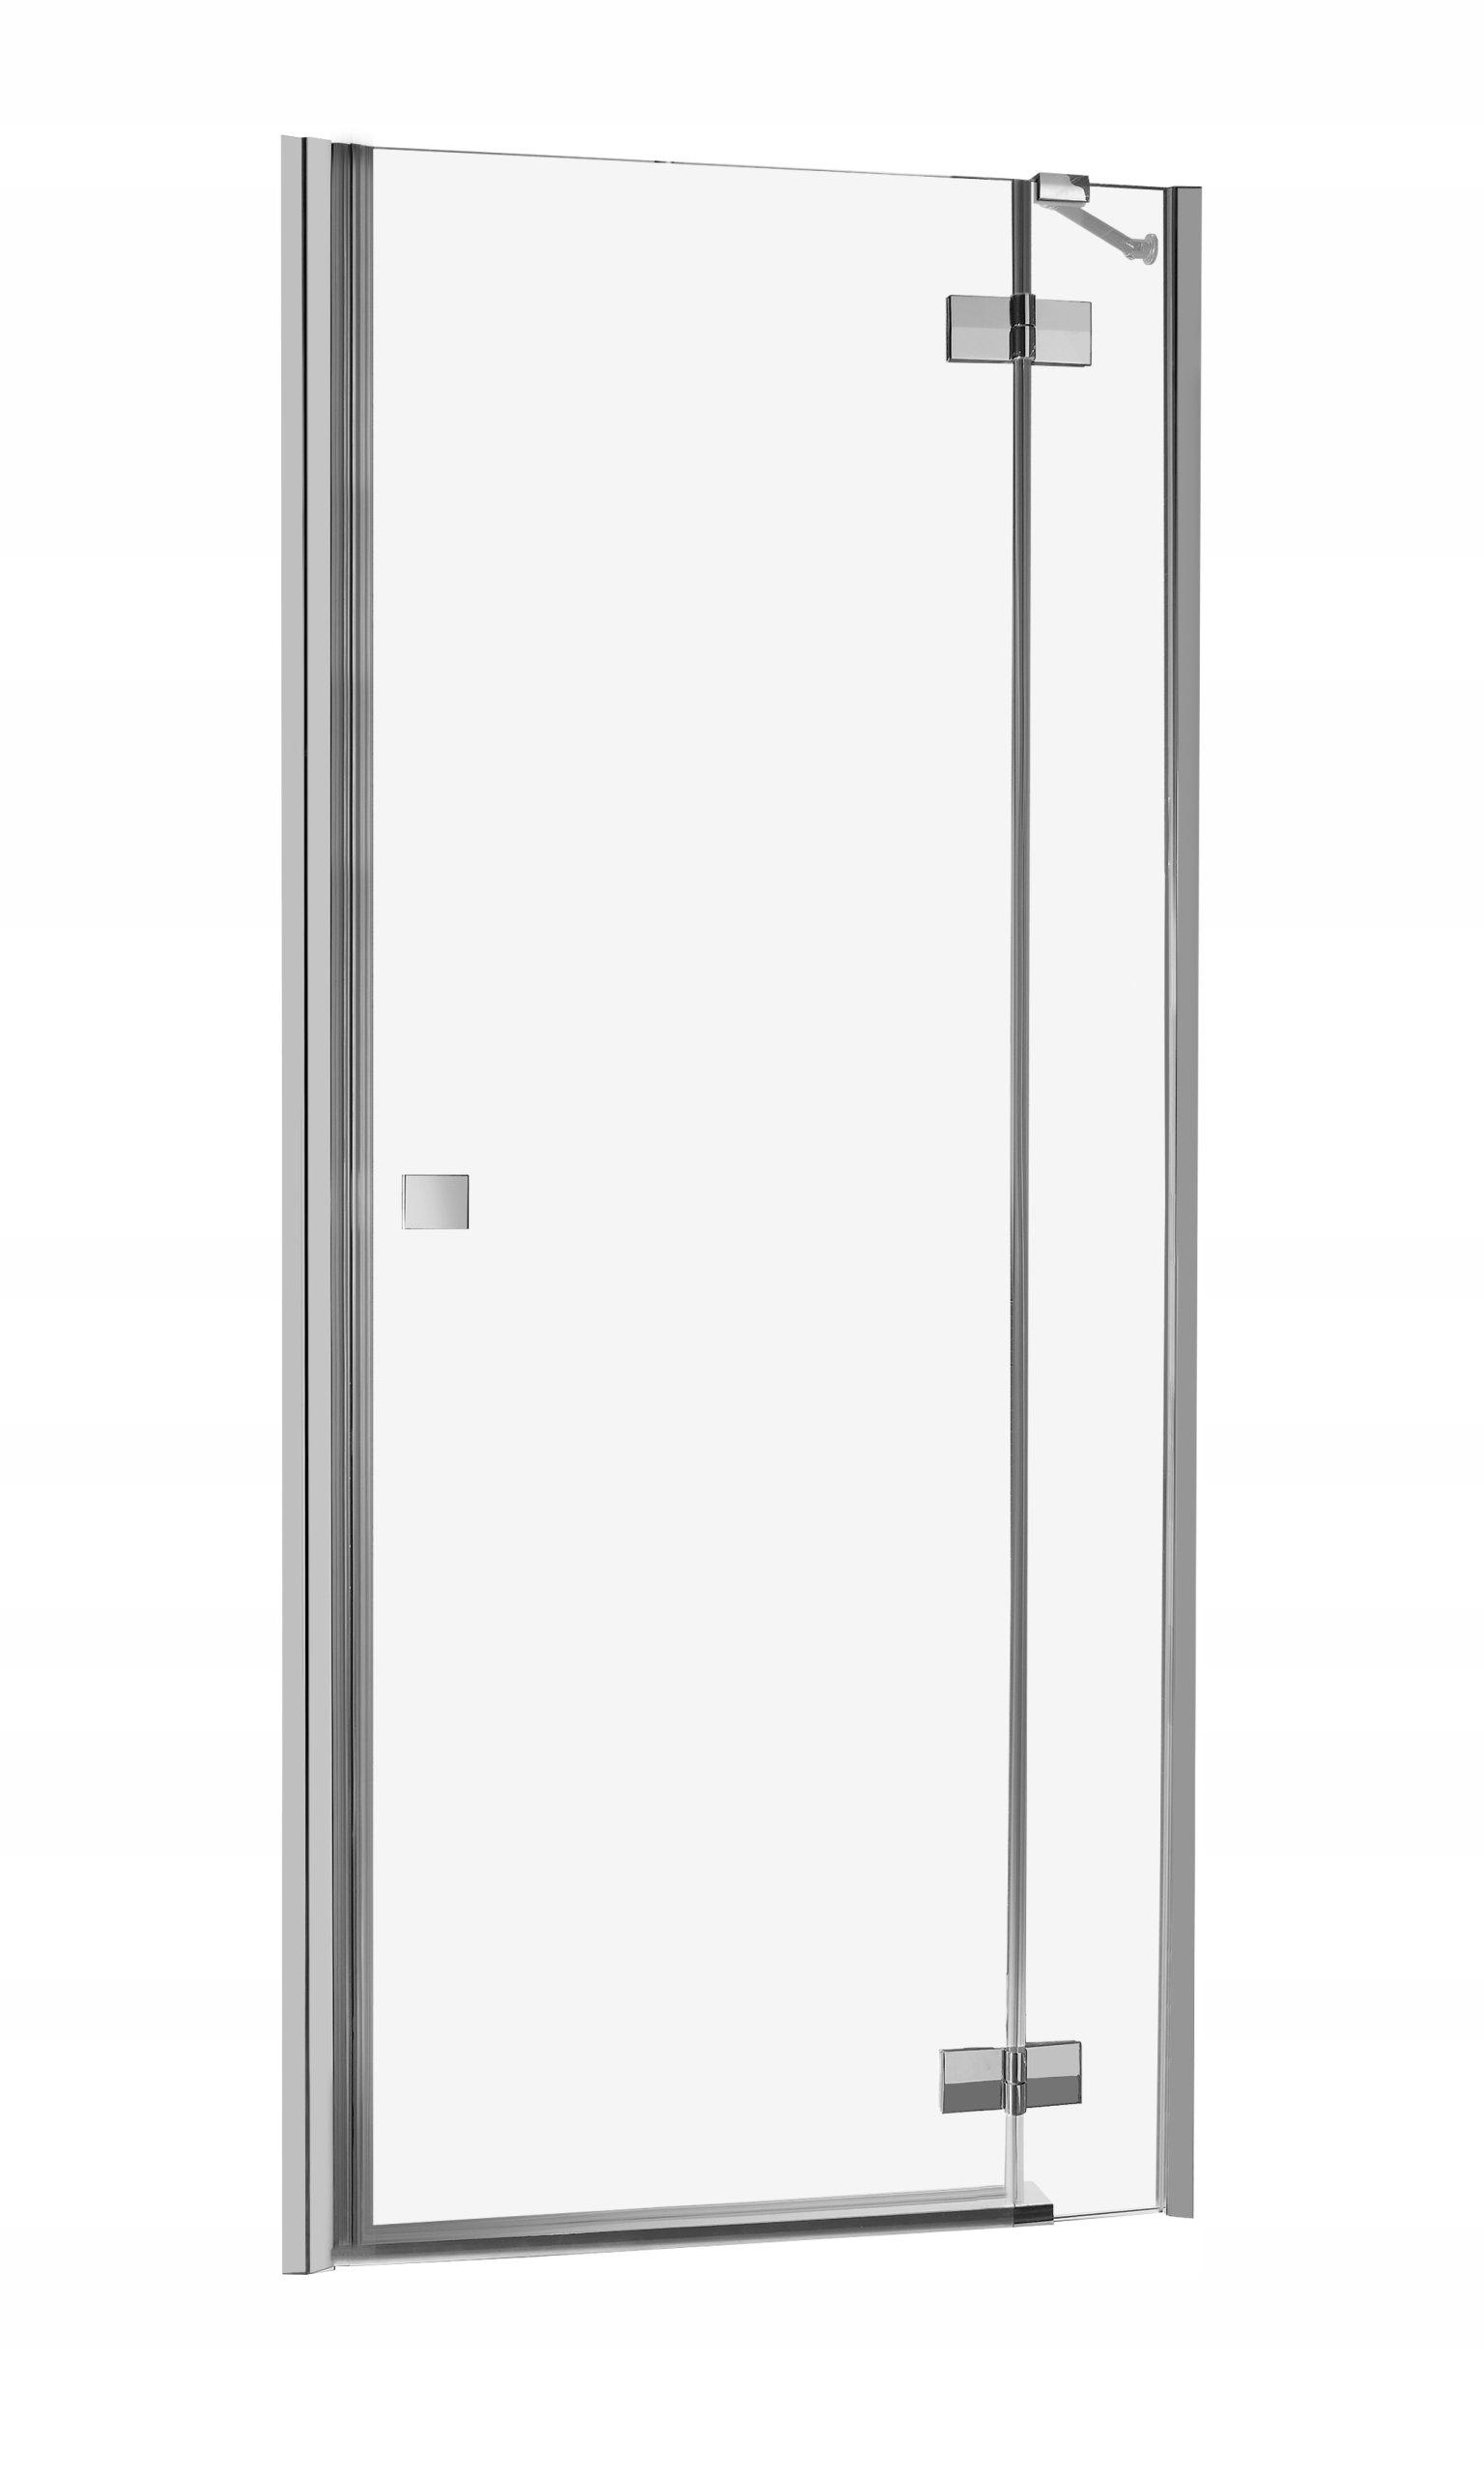 Výklenkové dvere Almatea DWJ 120x195 RADAWAY